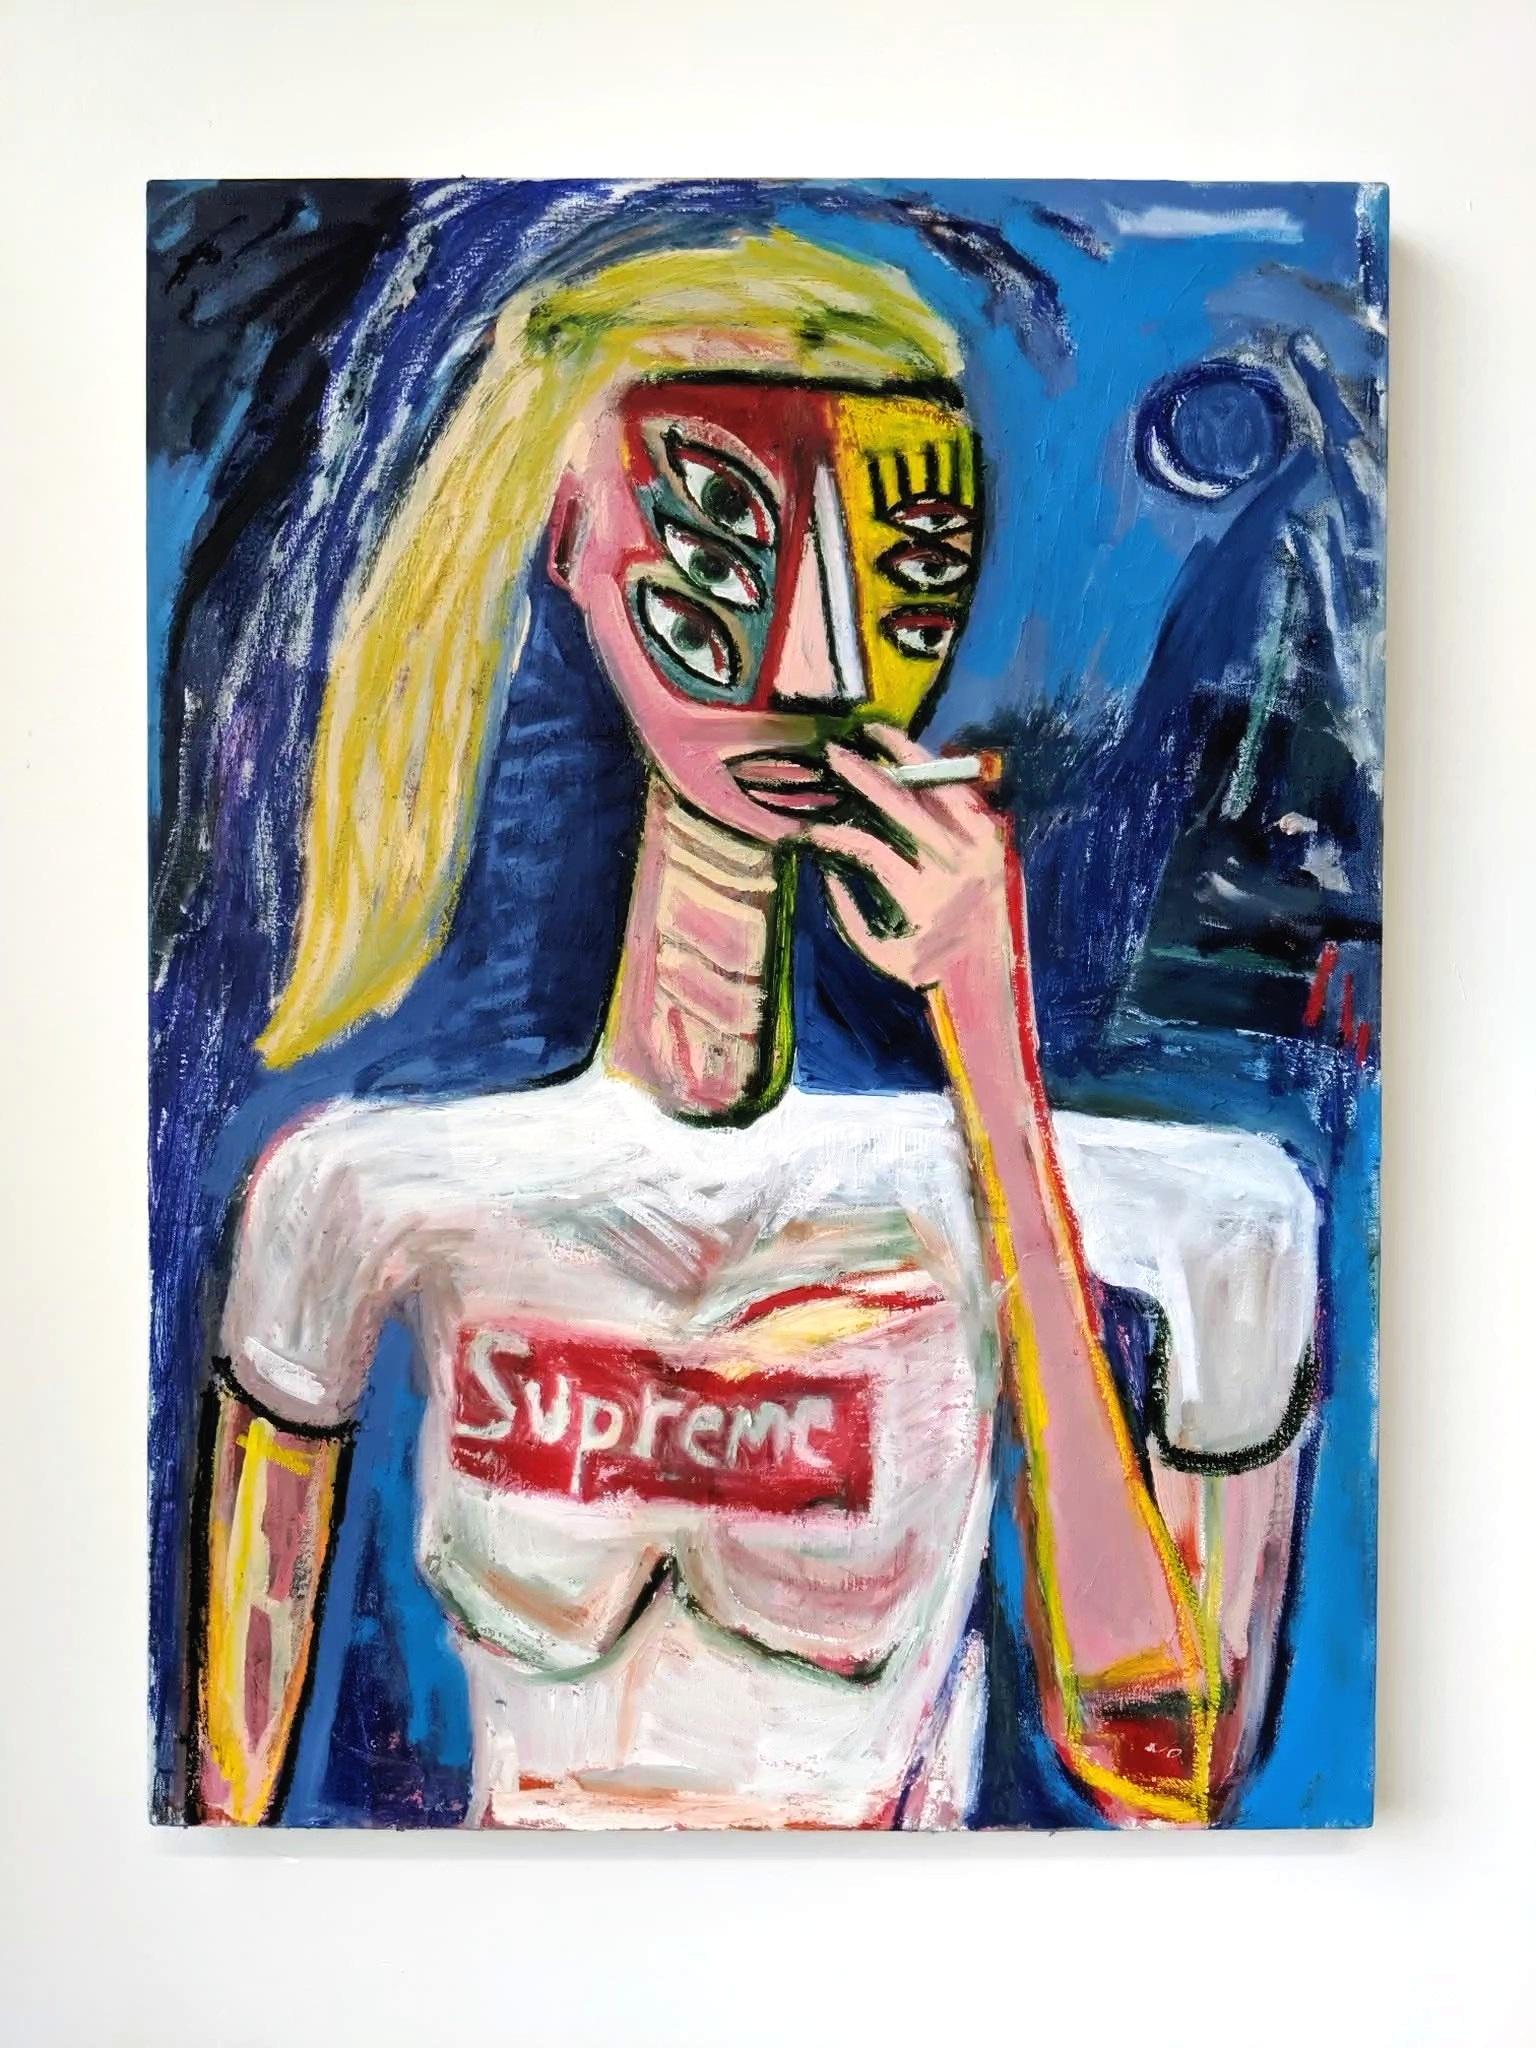 She's Supreme